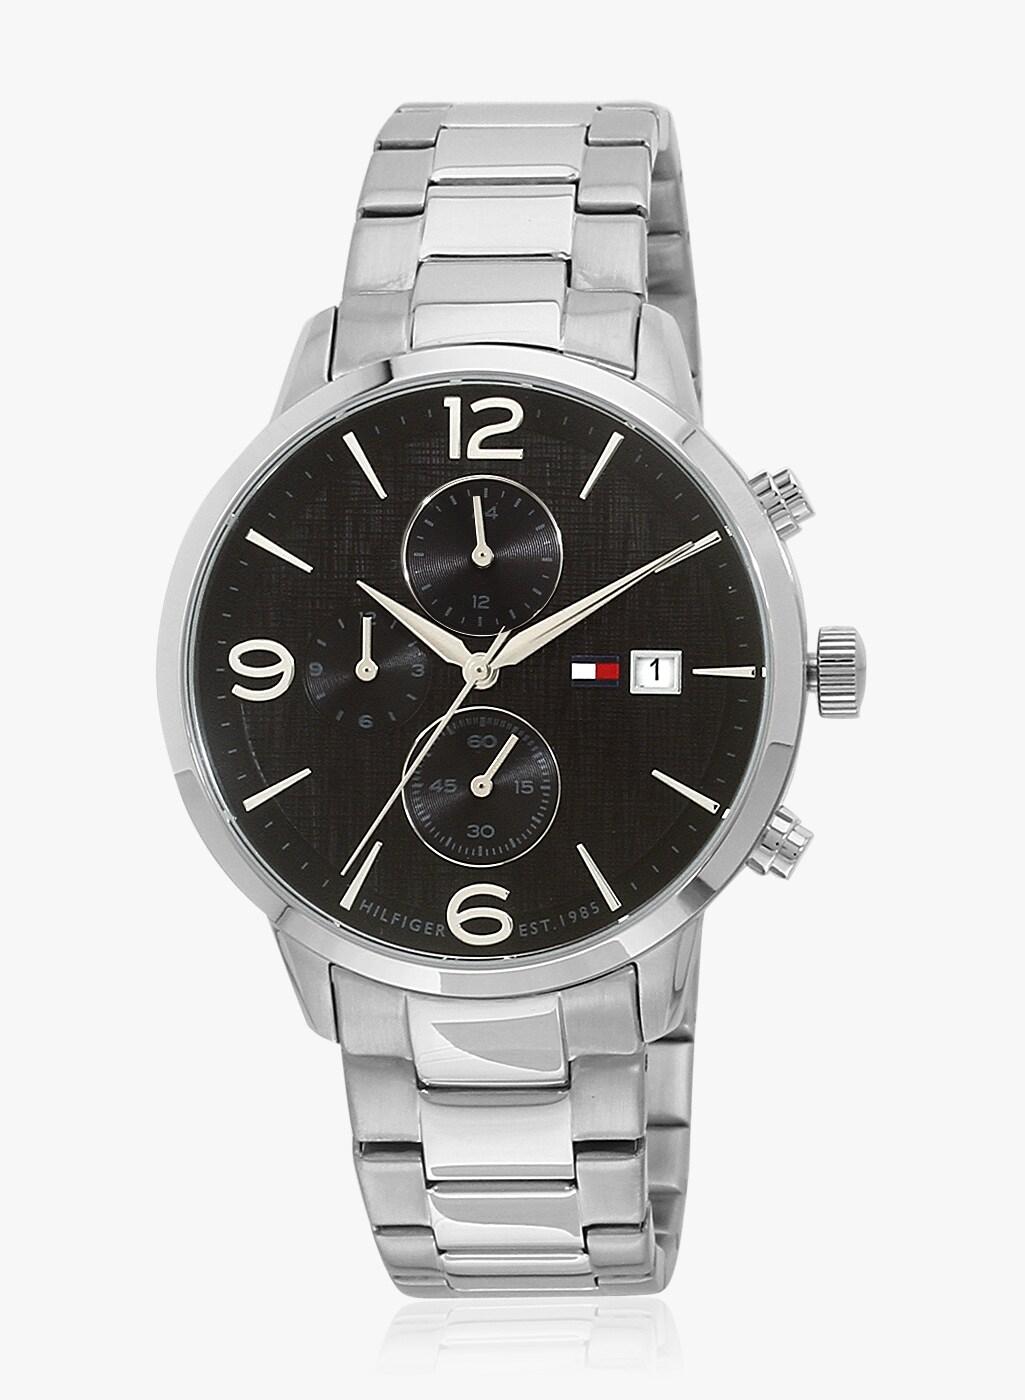 b6dde05441ba Men s Tommy Hilfiger Watches - Buy Tommy Hilfiger Watches for Men Online in  India